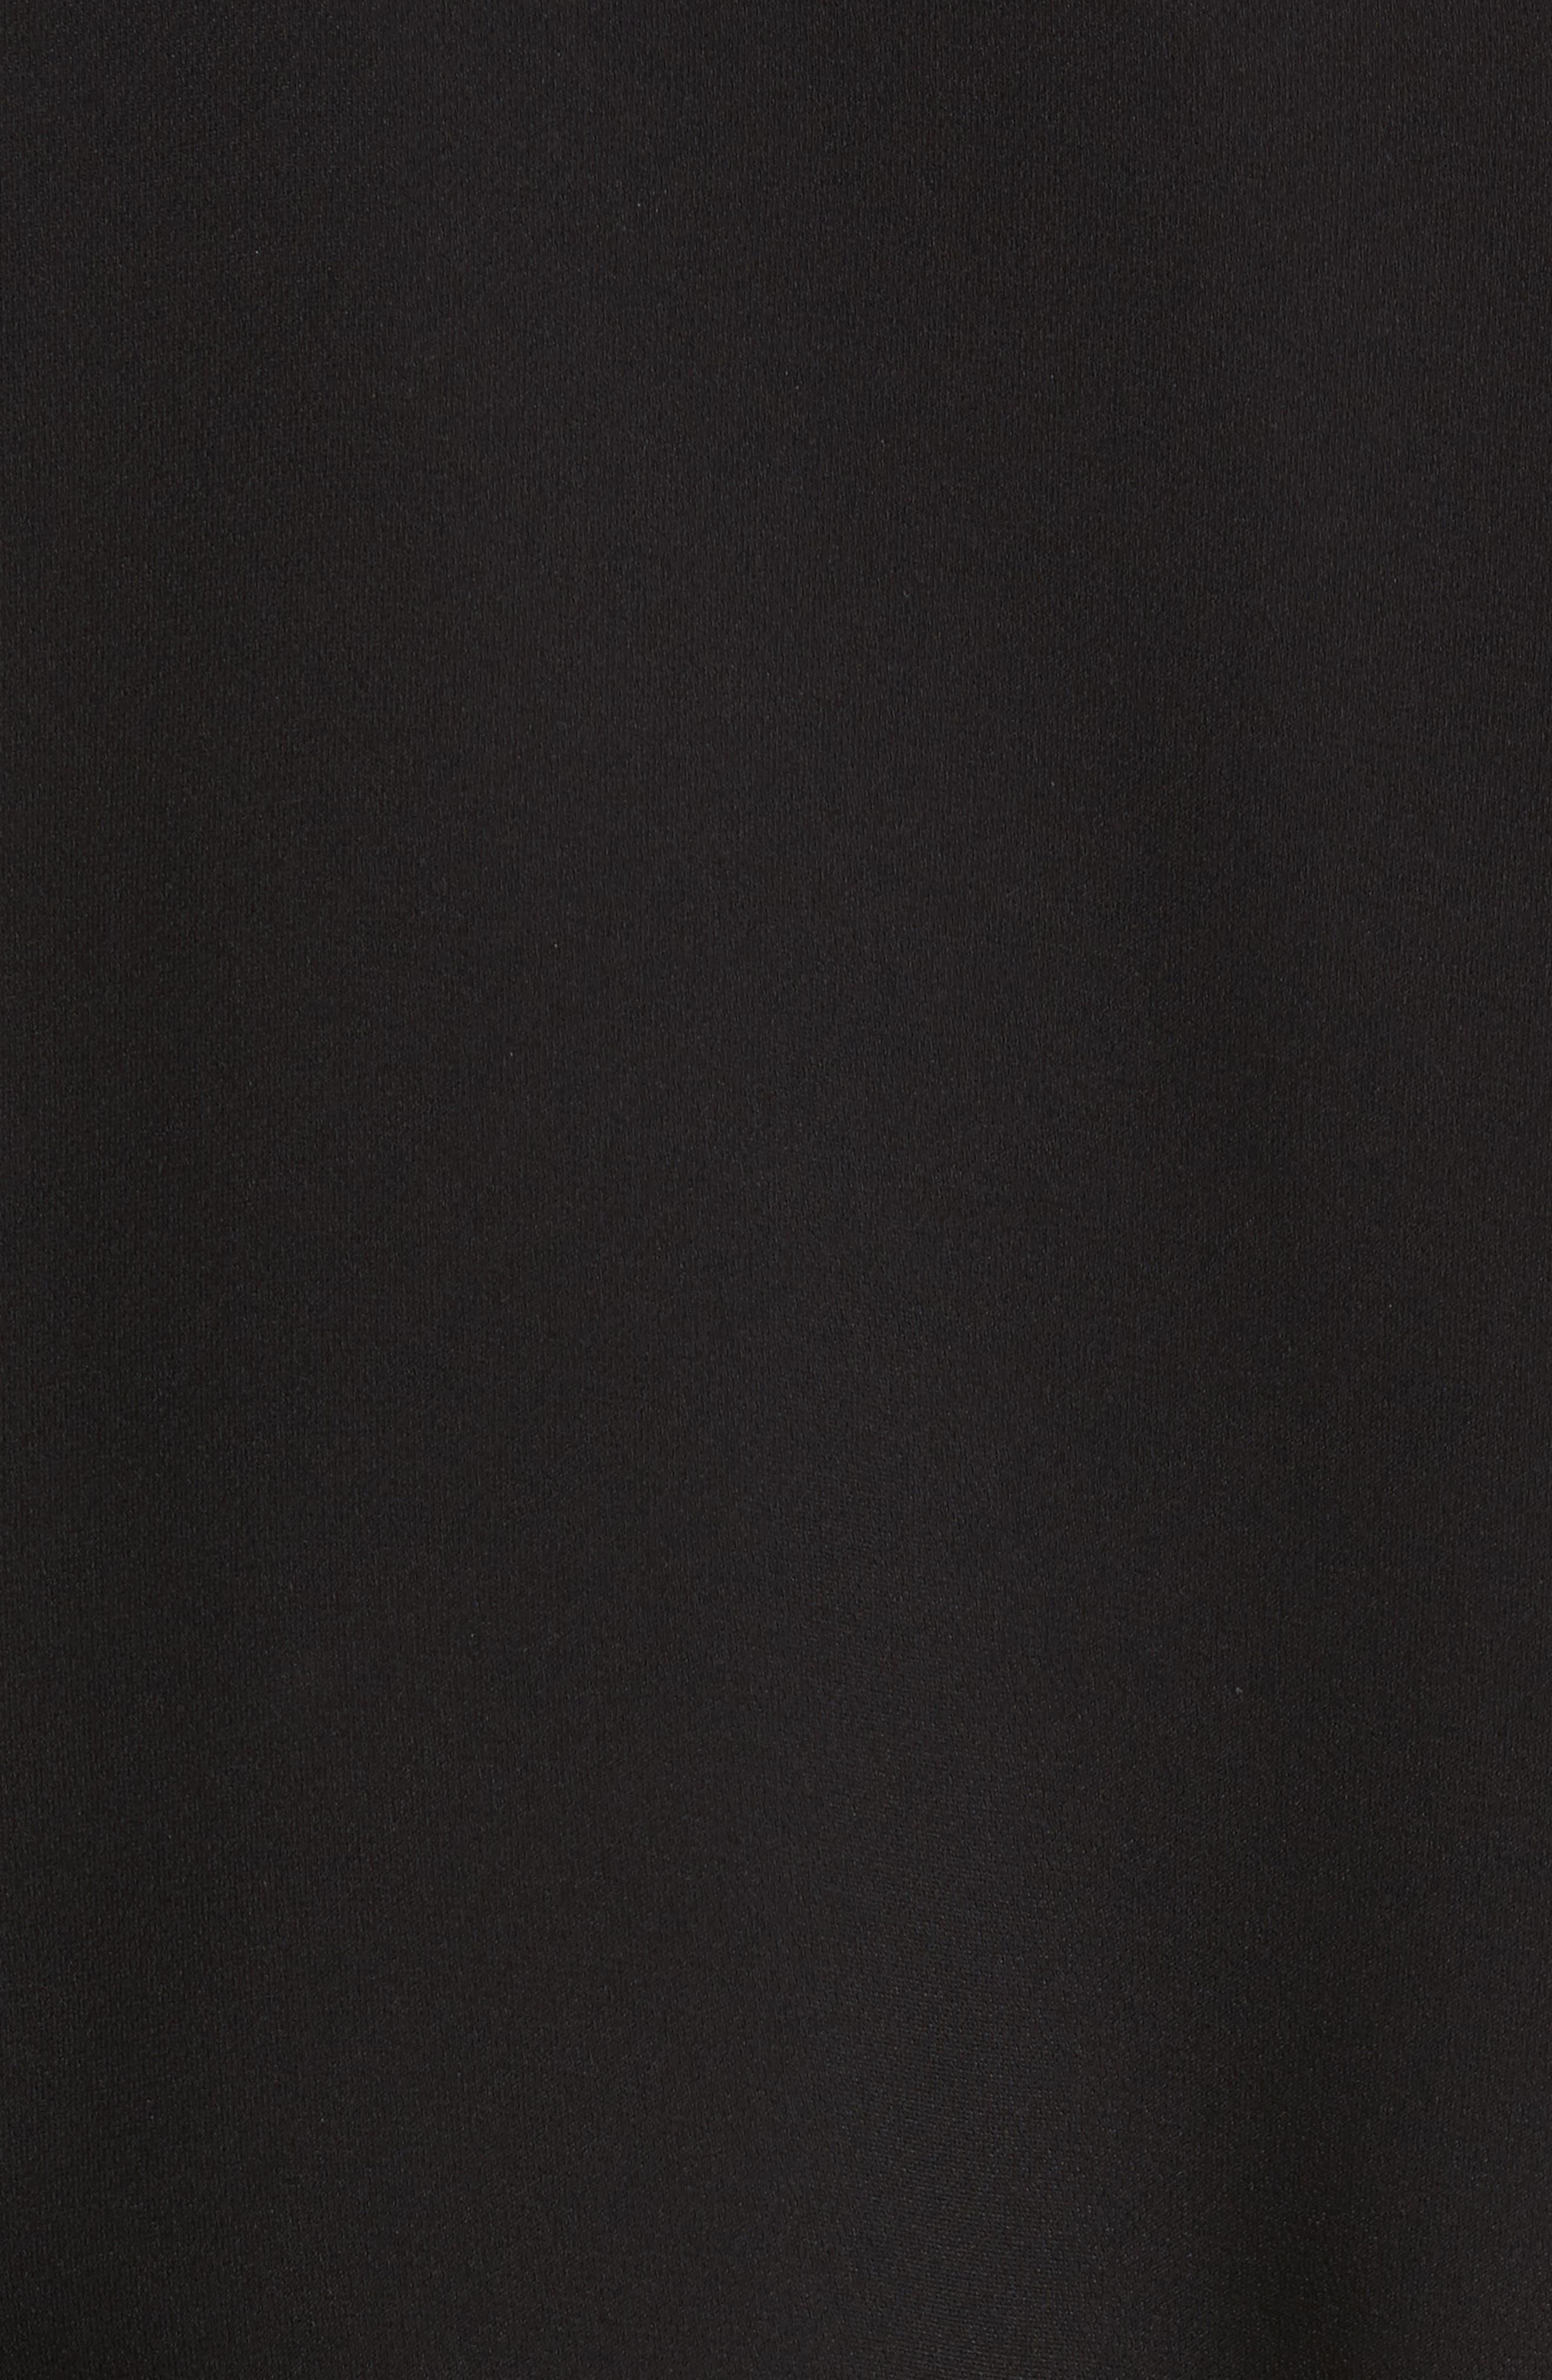 Lara One-Shoulder Tie Silk Top,                             Alternate thumbnail 5, color,                             001